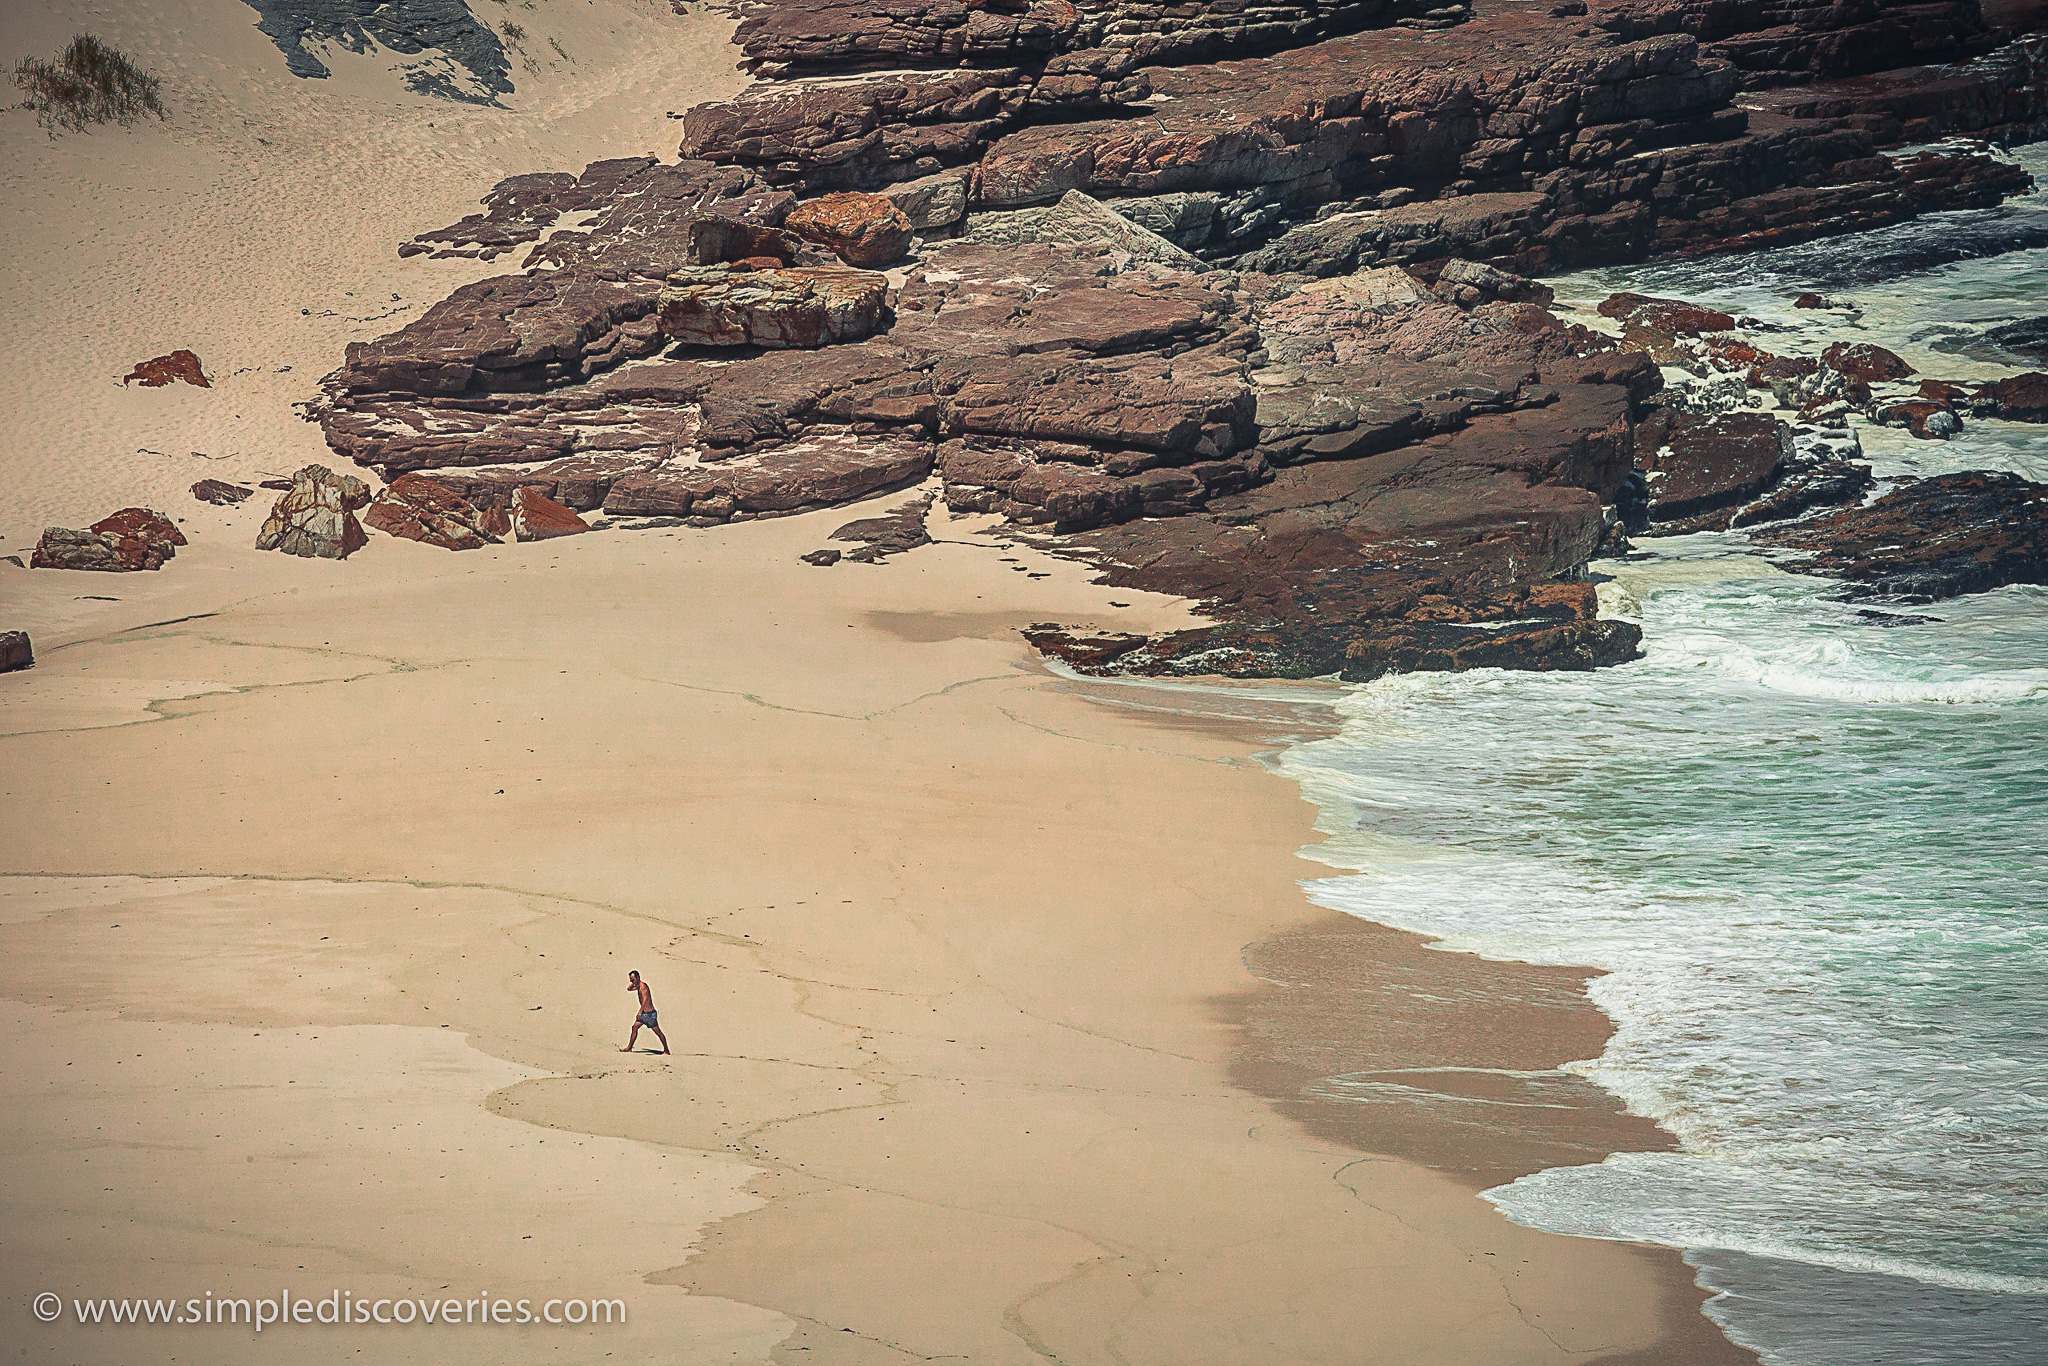 cape_of_good_hope_beach